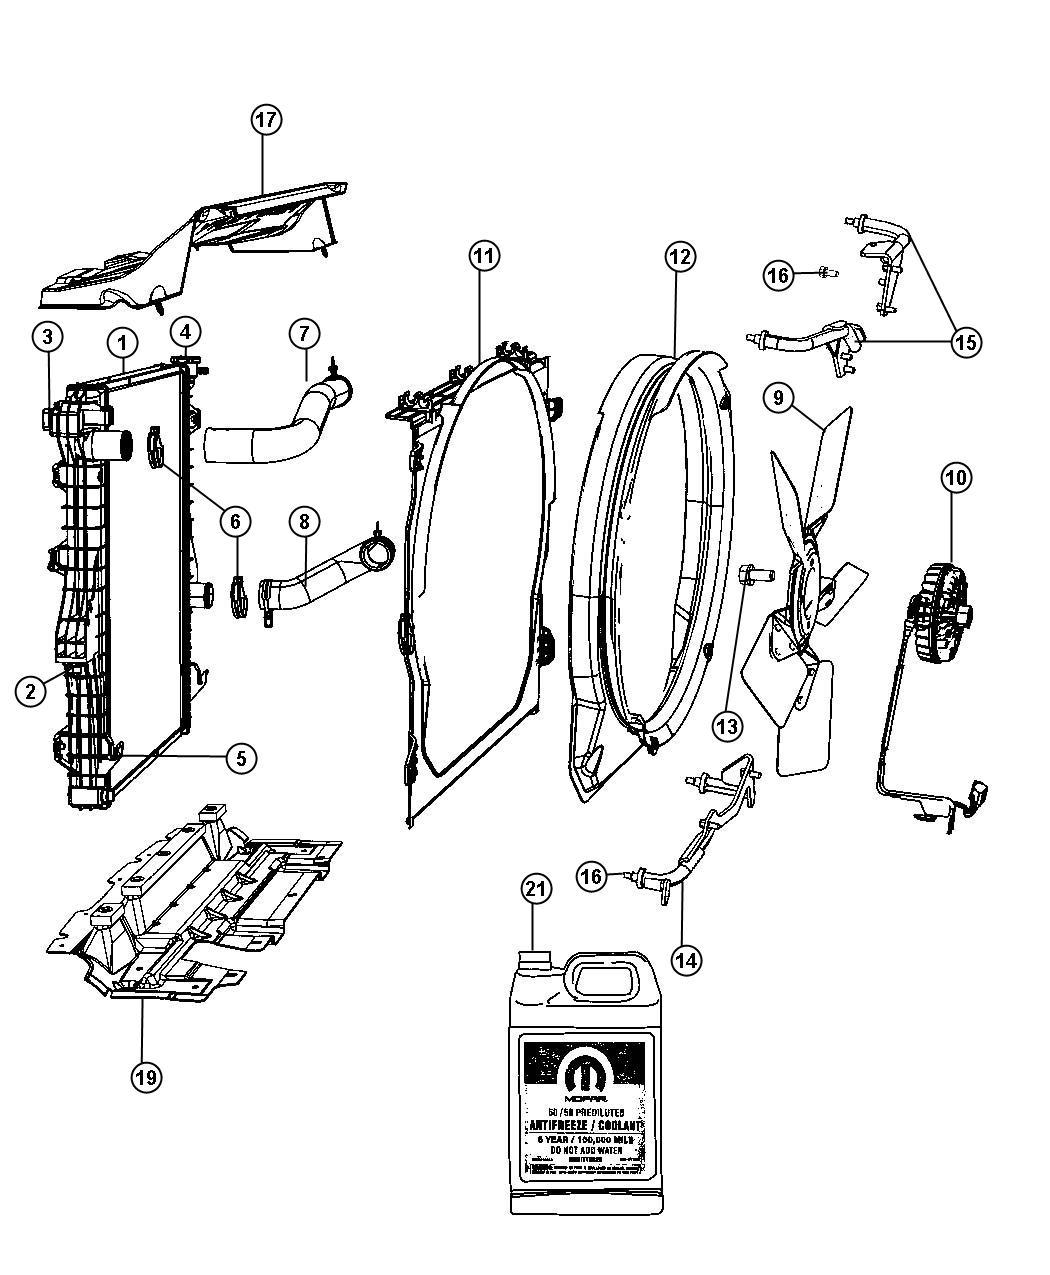 2012 Dodge Ram 2500 Isolator, isolator kit. Radiator. End